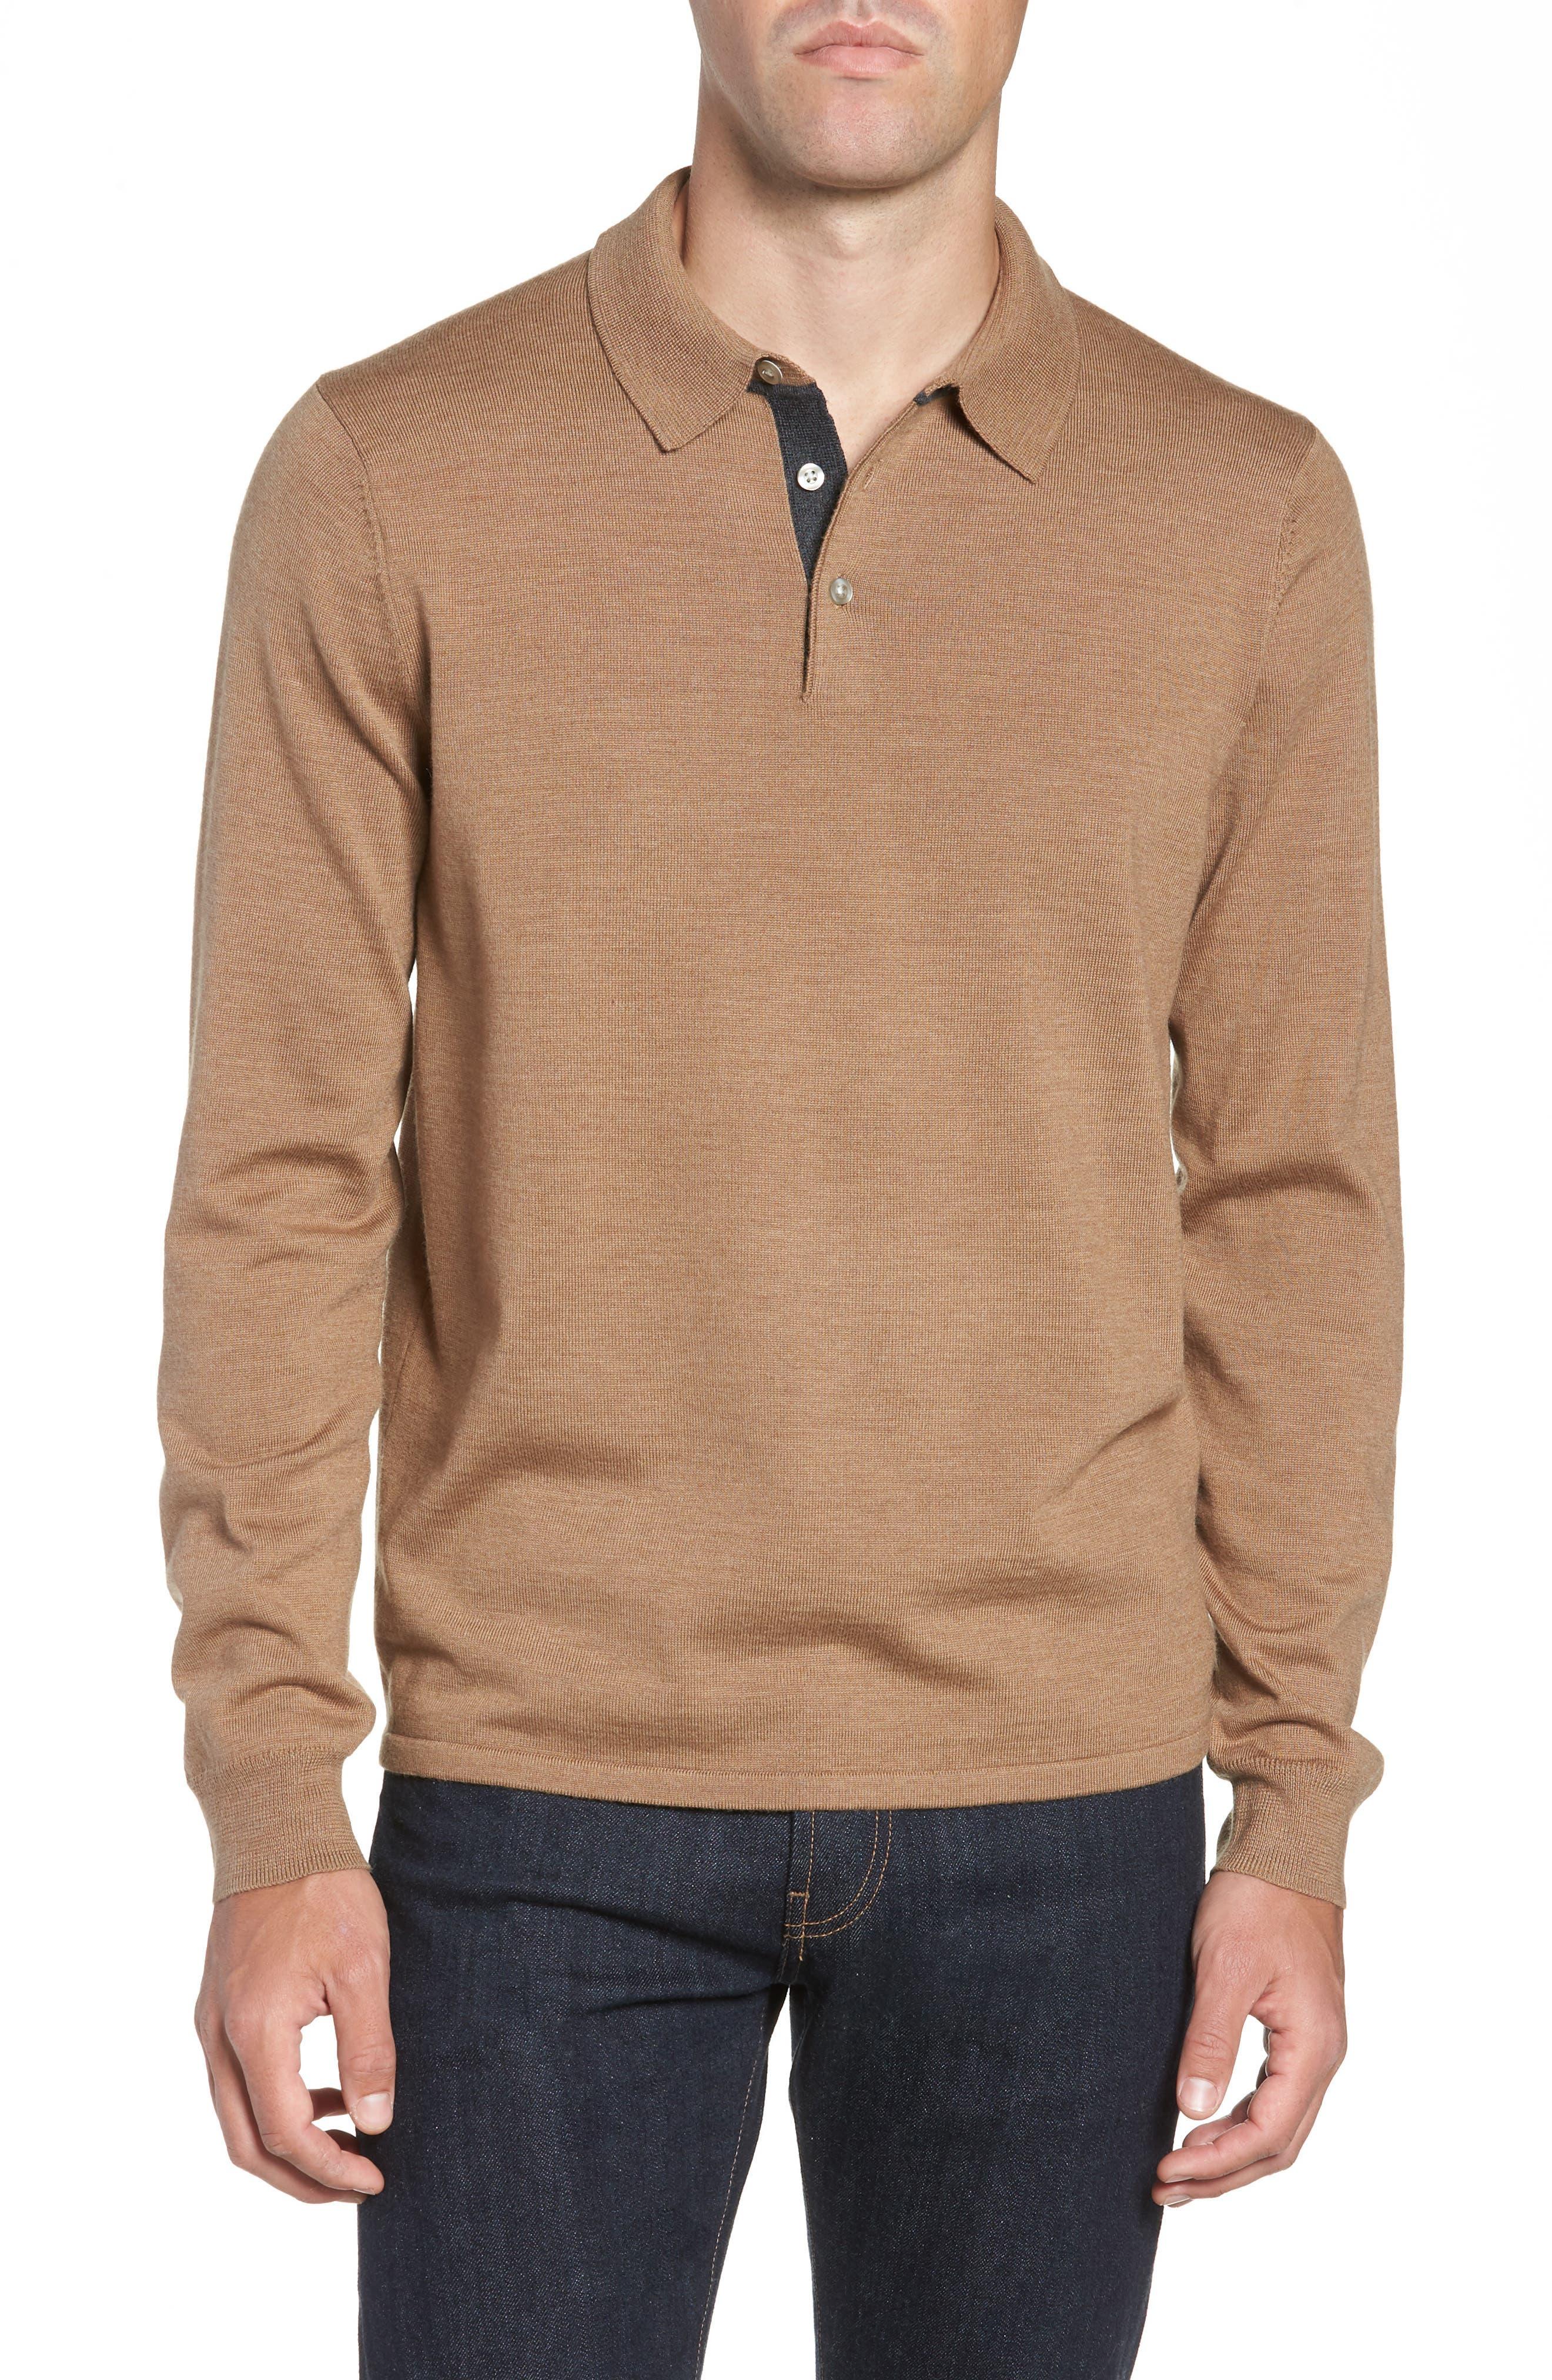 NORDSTROM MEN'S SHOP Merino Wool Polo Sweater, Main, color, 211